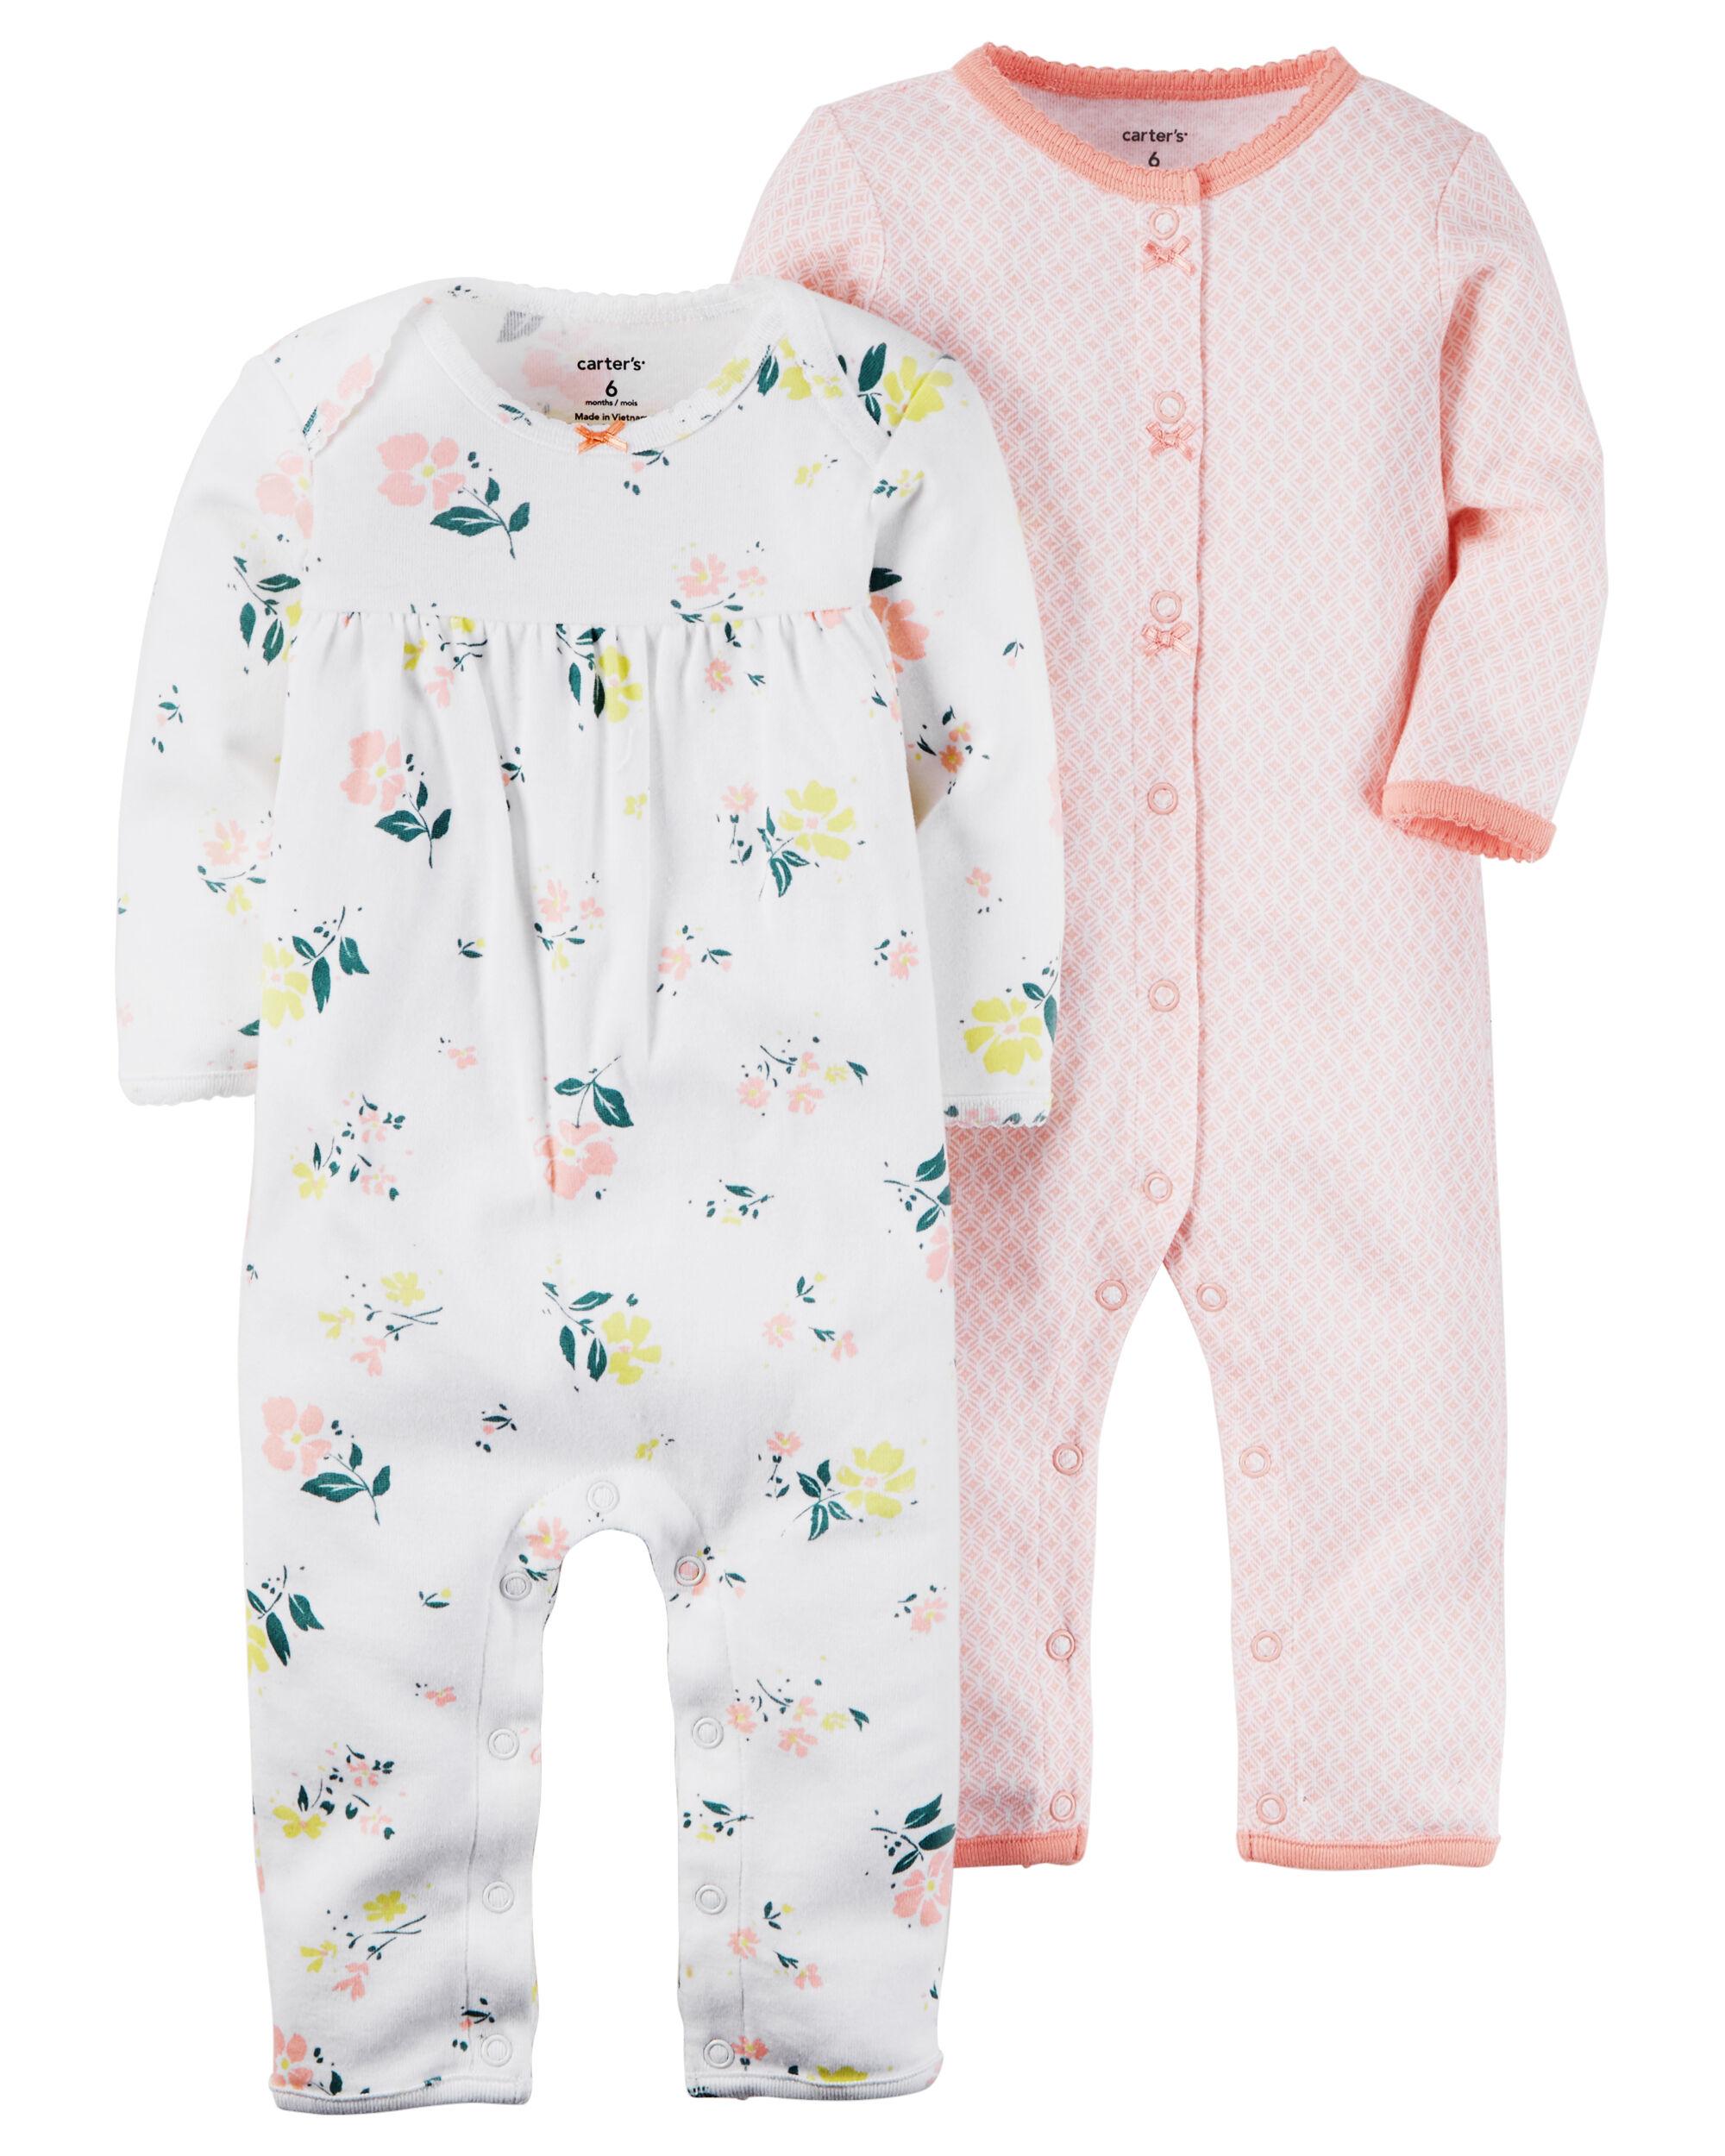 2-Pack Babysoft Coveralls | Carters.com